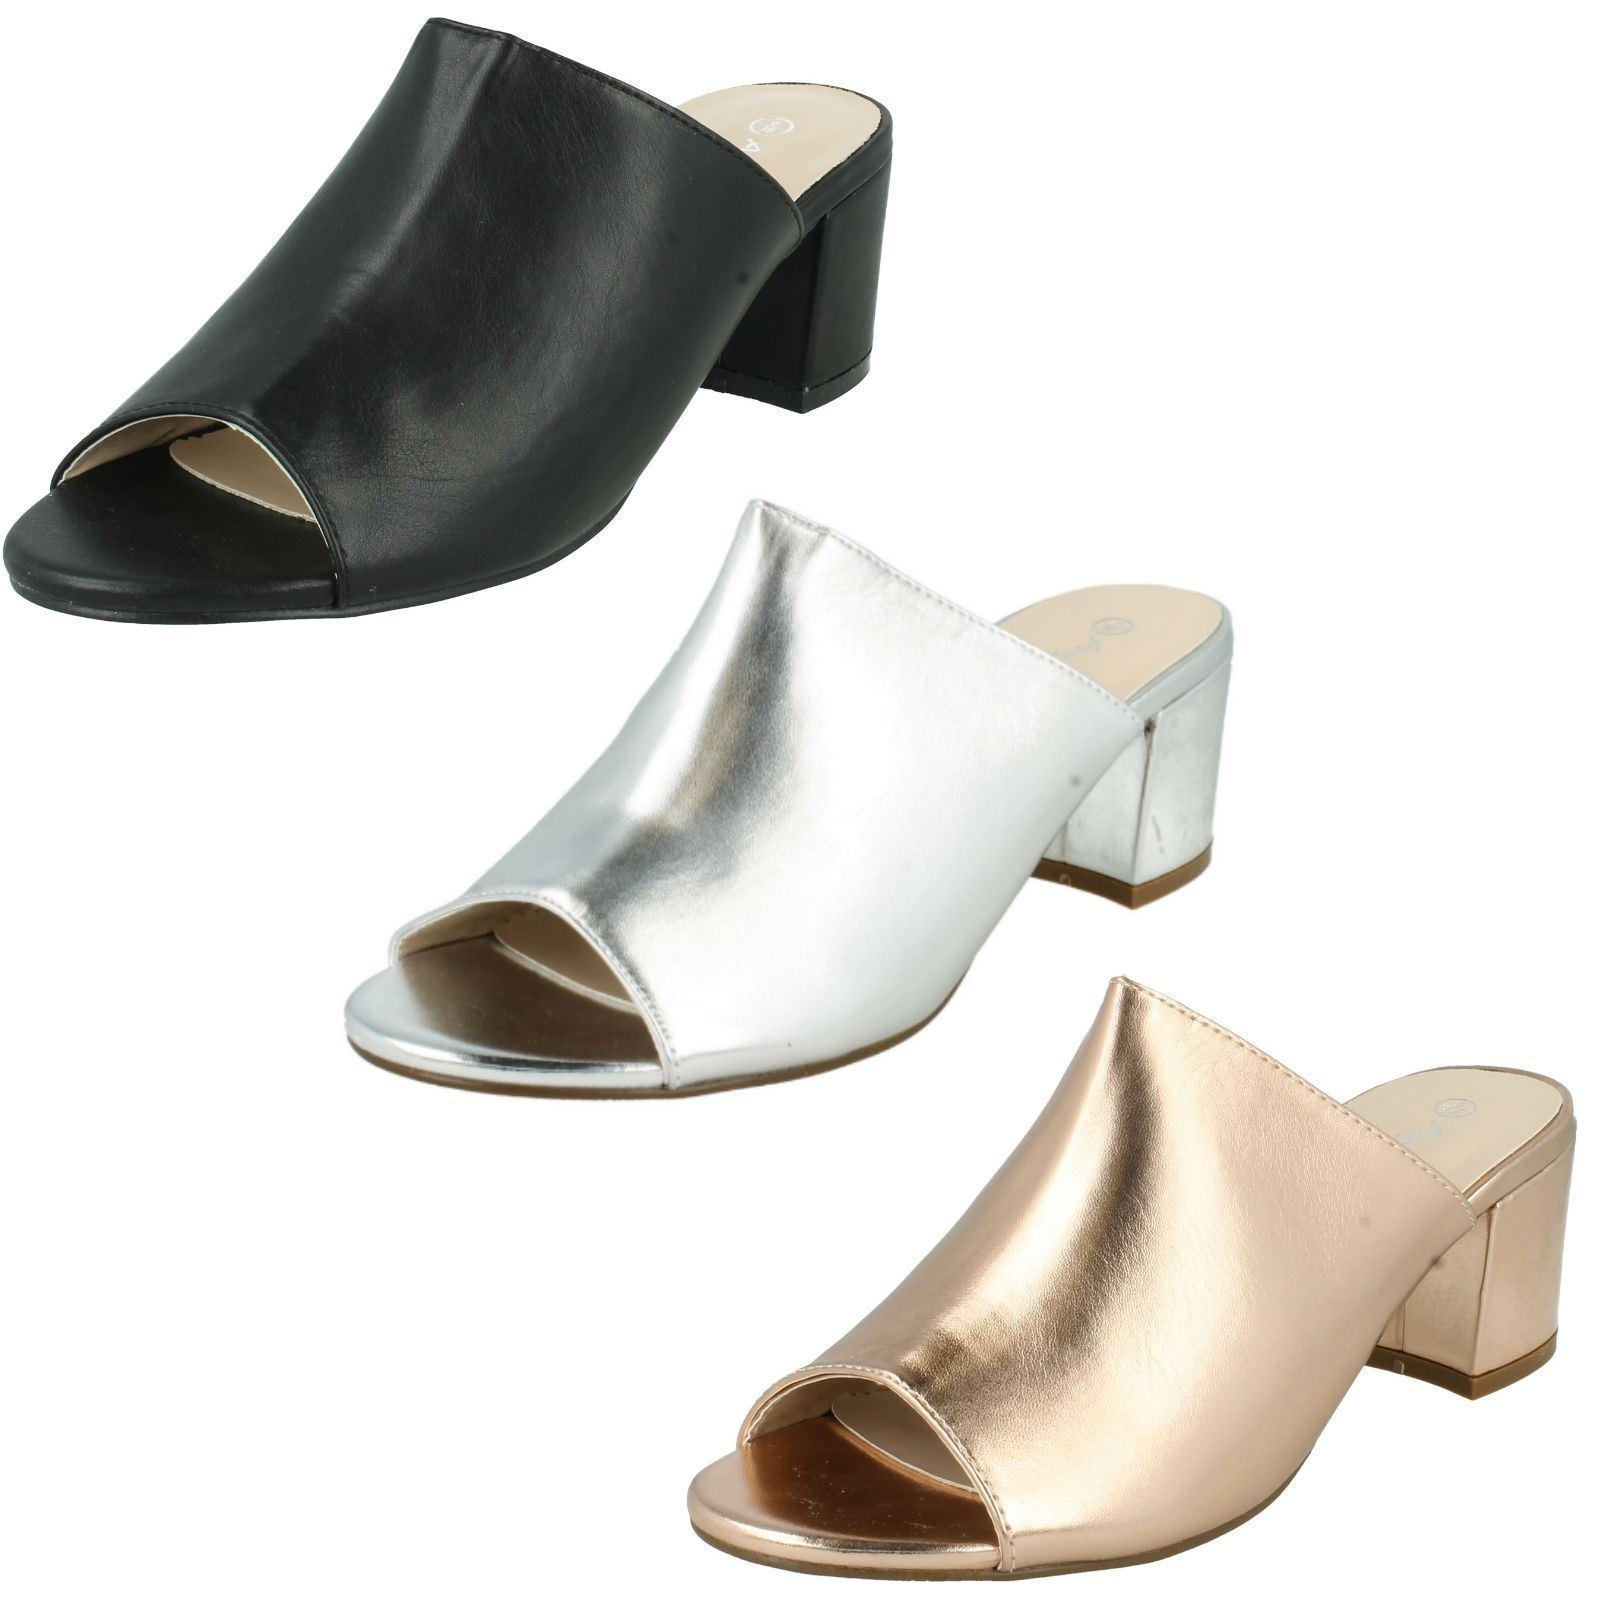 Ladies Anne Michelle Slip On Mules Mid Block F10664 Heels The Style - F10664 Block 39b14f